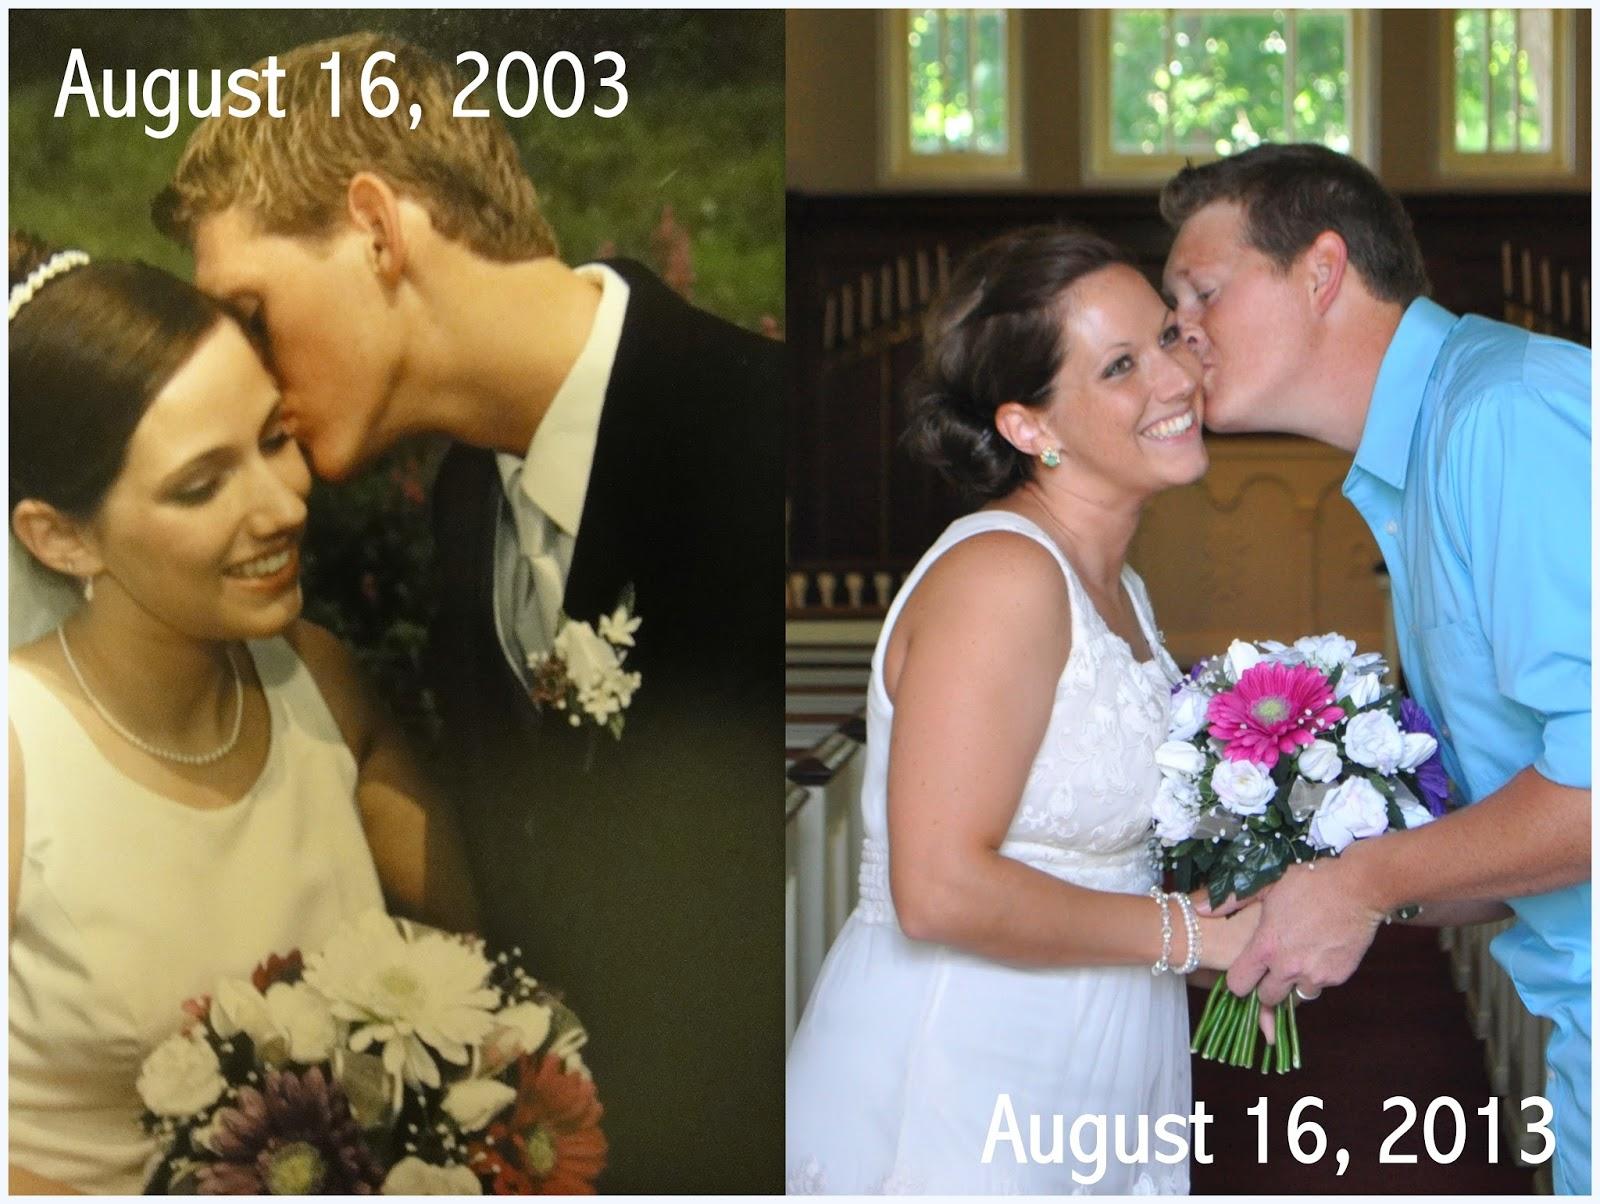 10 year anniversary photo ideas